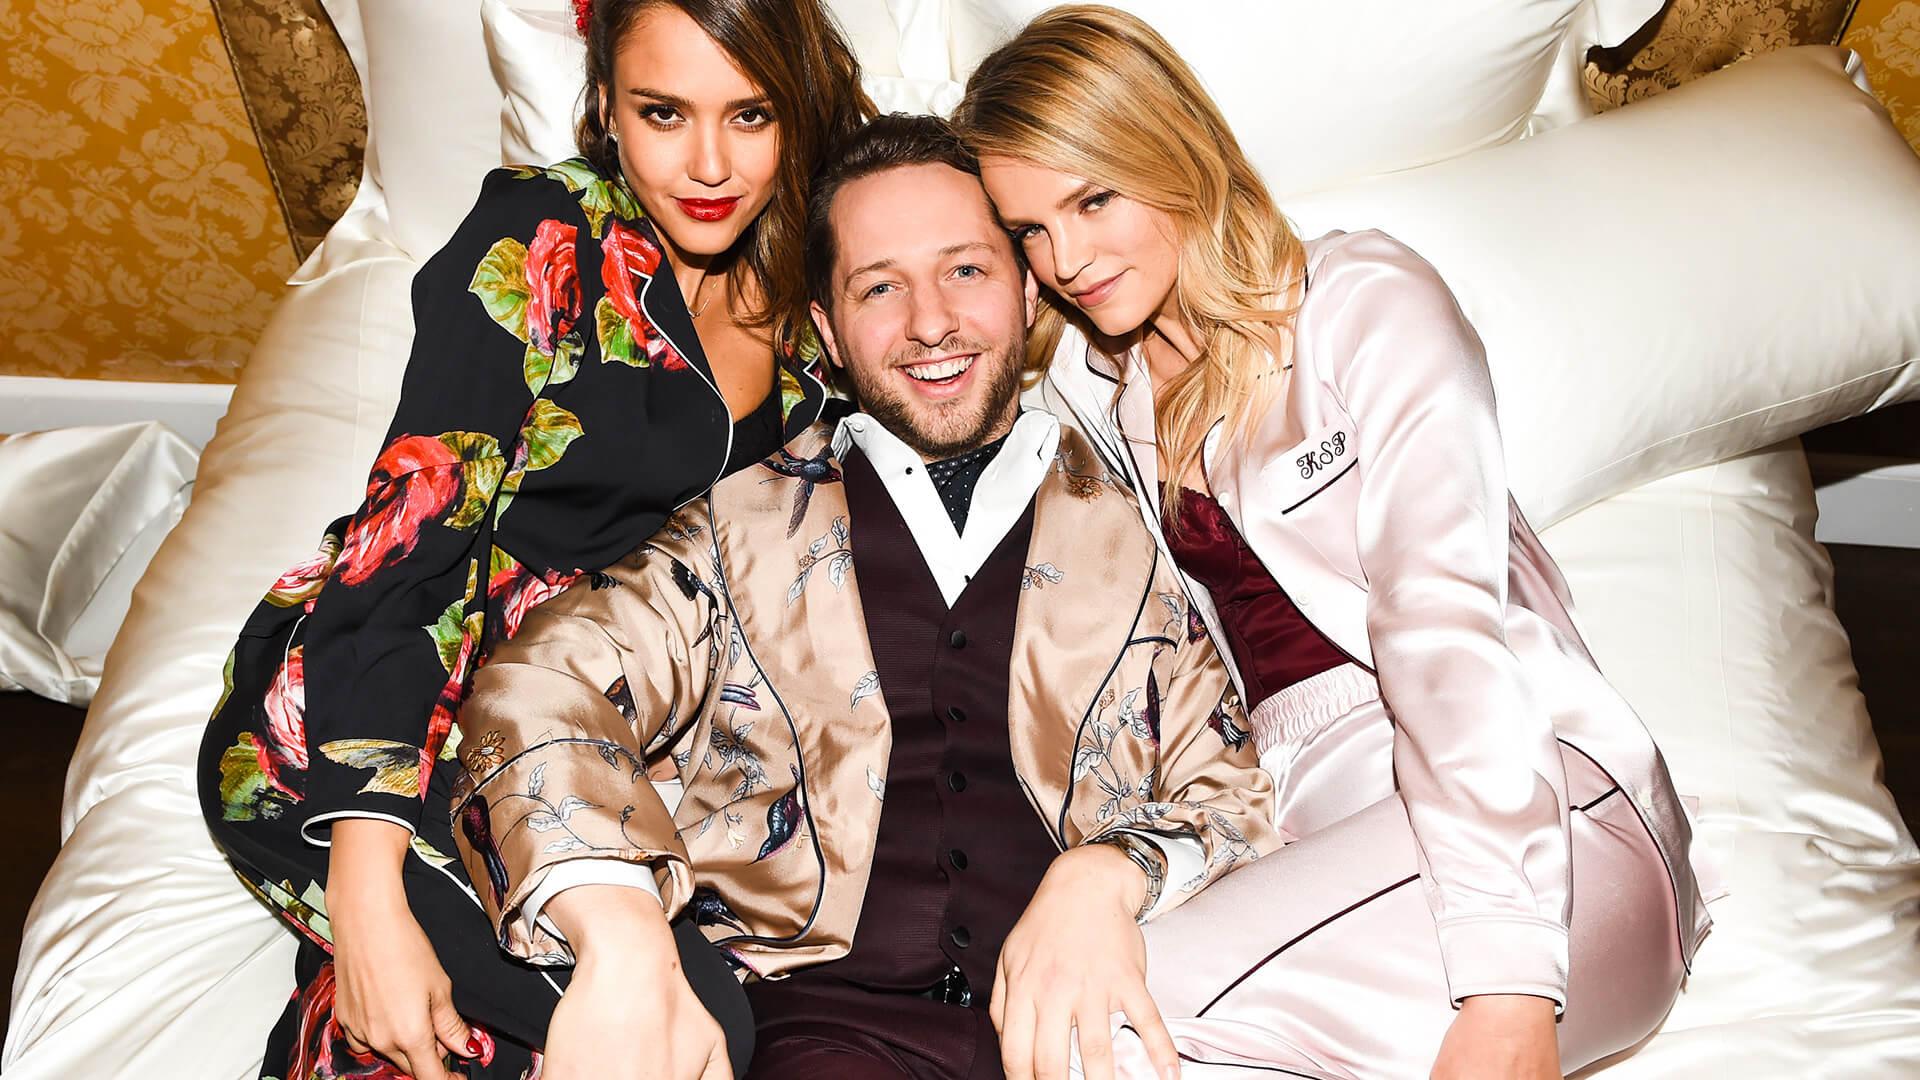 Dolce & Gabbana於2016年舉辦以睡衣為題的時裝派對,成為當年一時佳話。